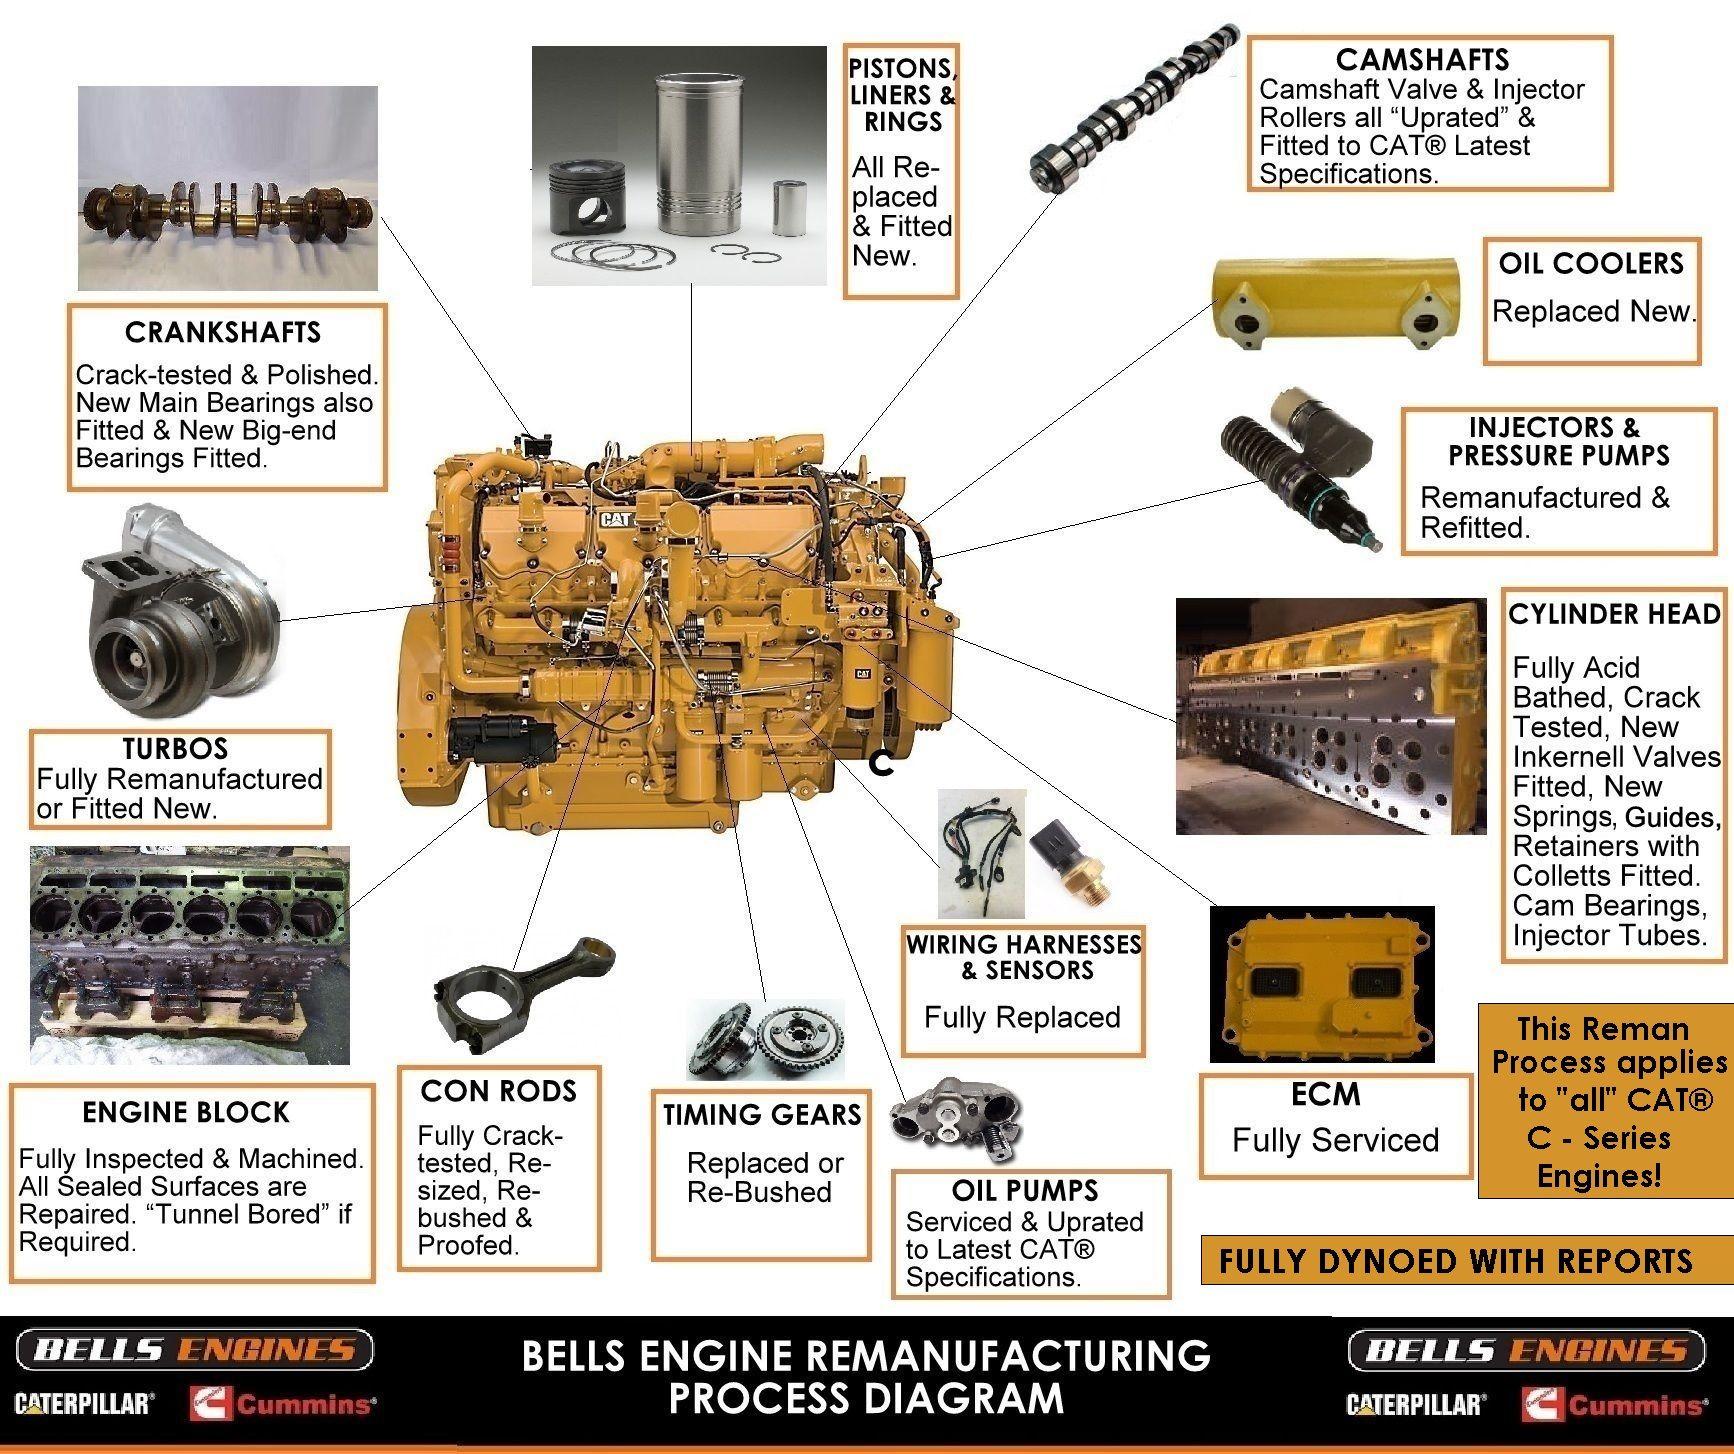 The Caterpillar® and Cummins® Engine Remanufacturing Process